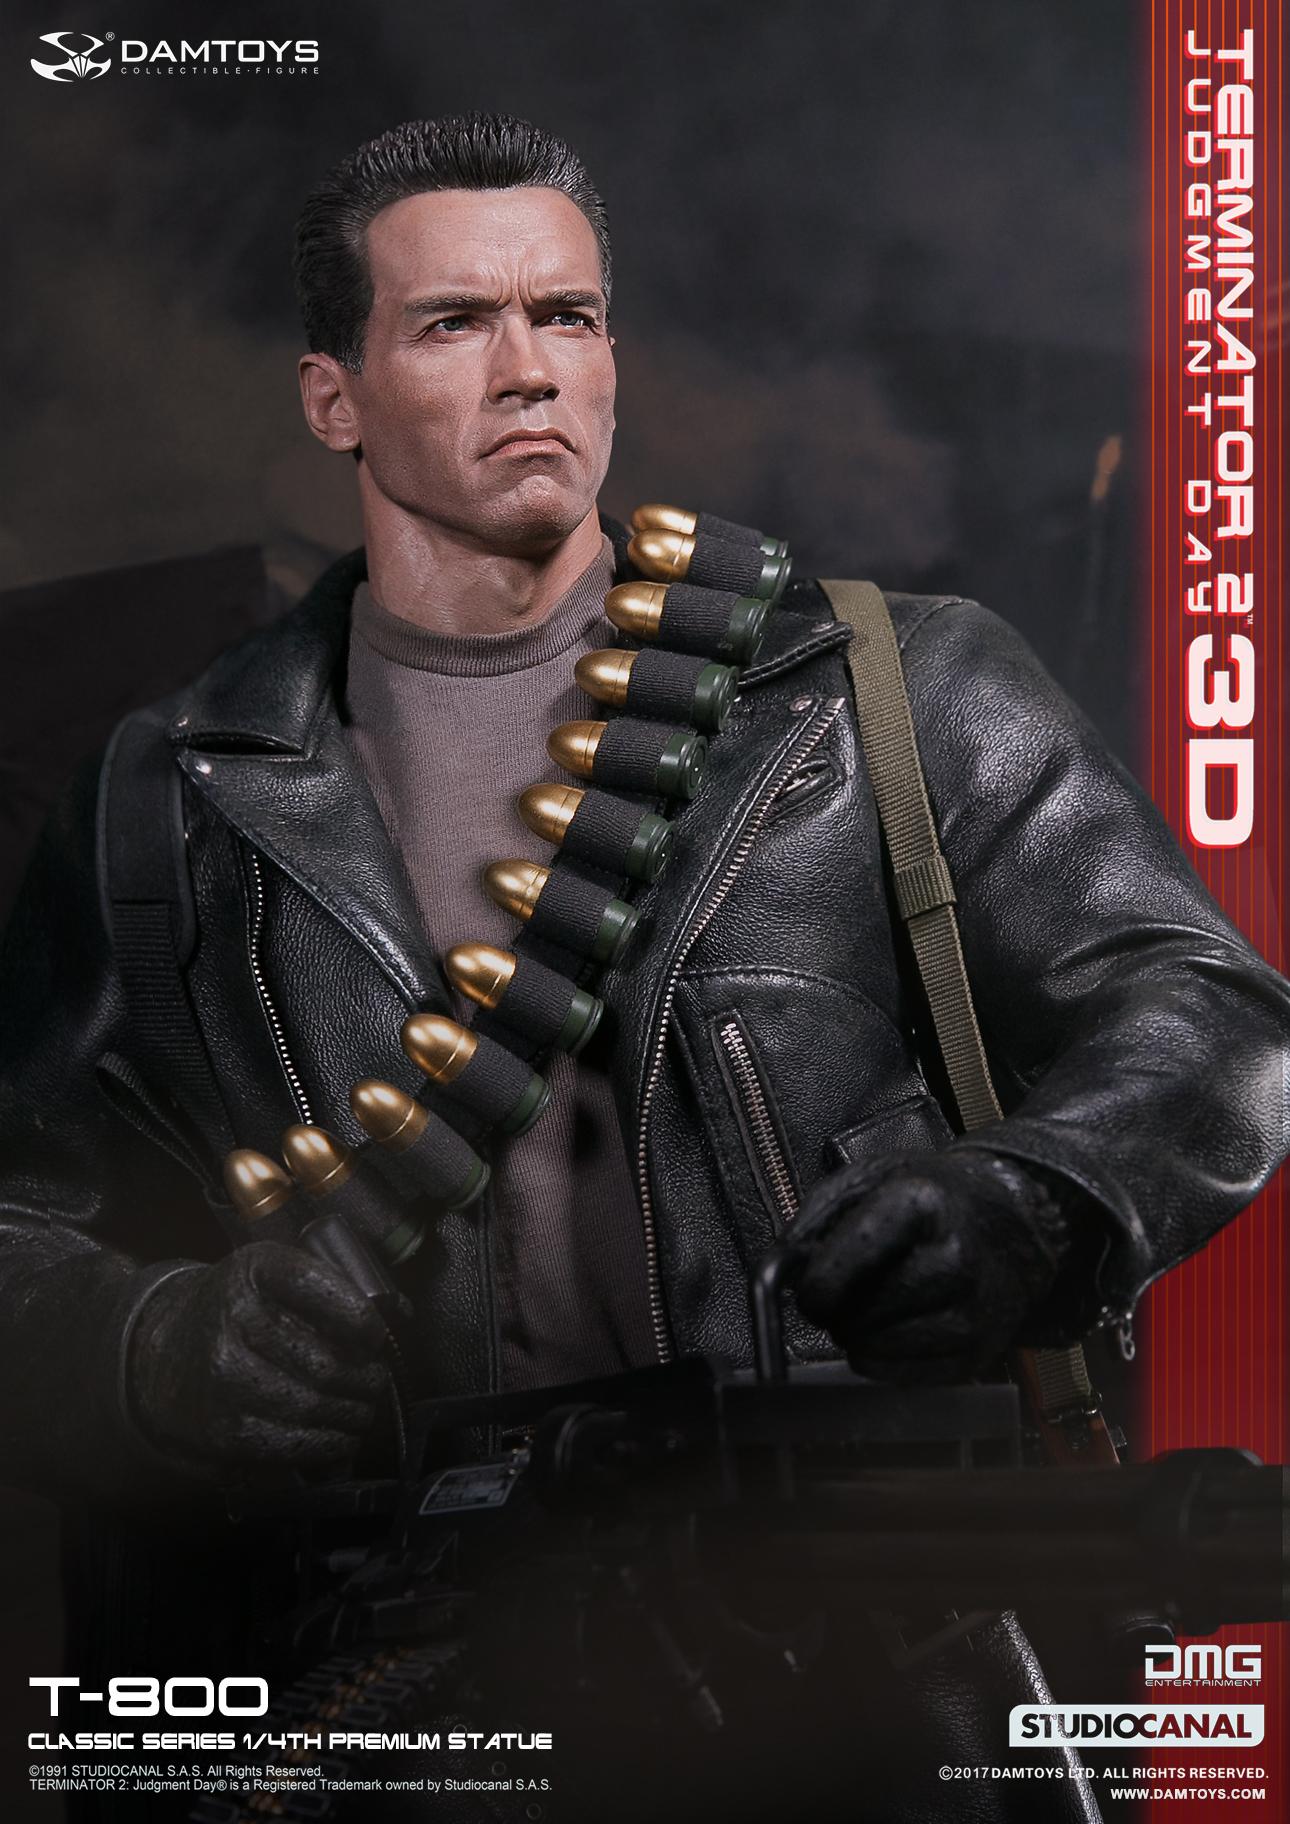 DAMTOYS CS001 CLASSIC SERIES 1/4 Terminator 2: Judgment Day - T-800